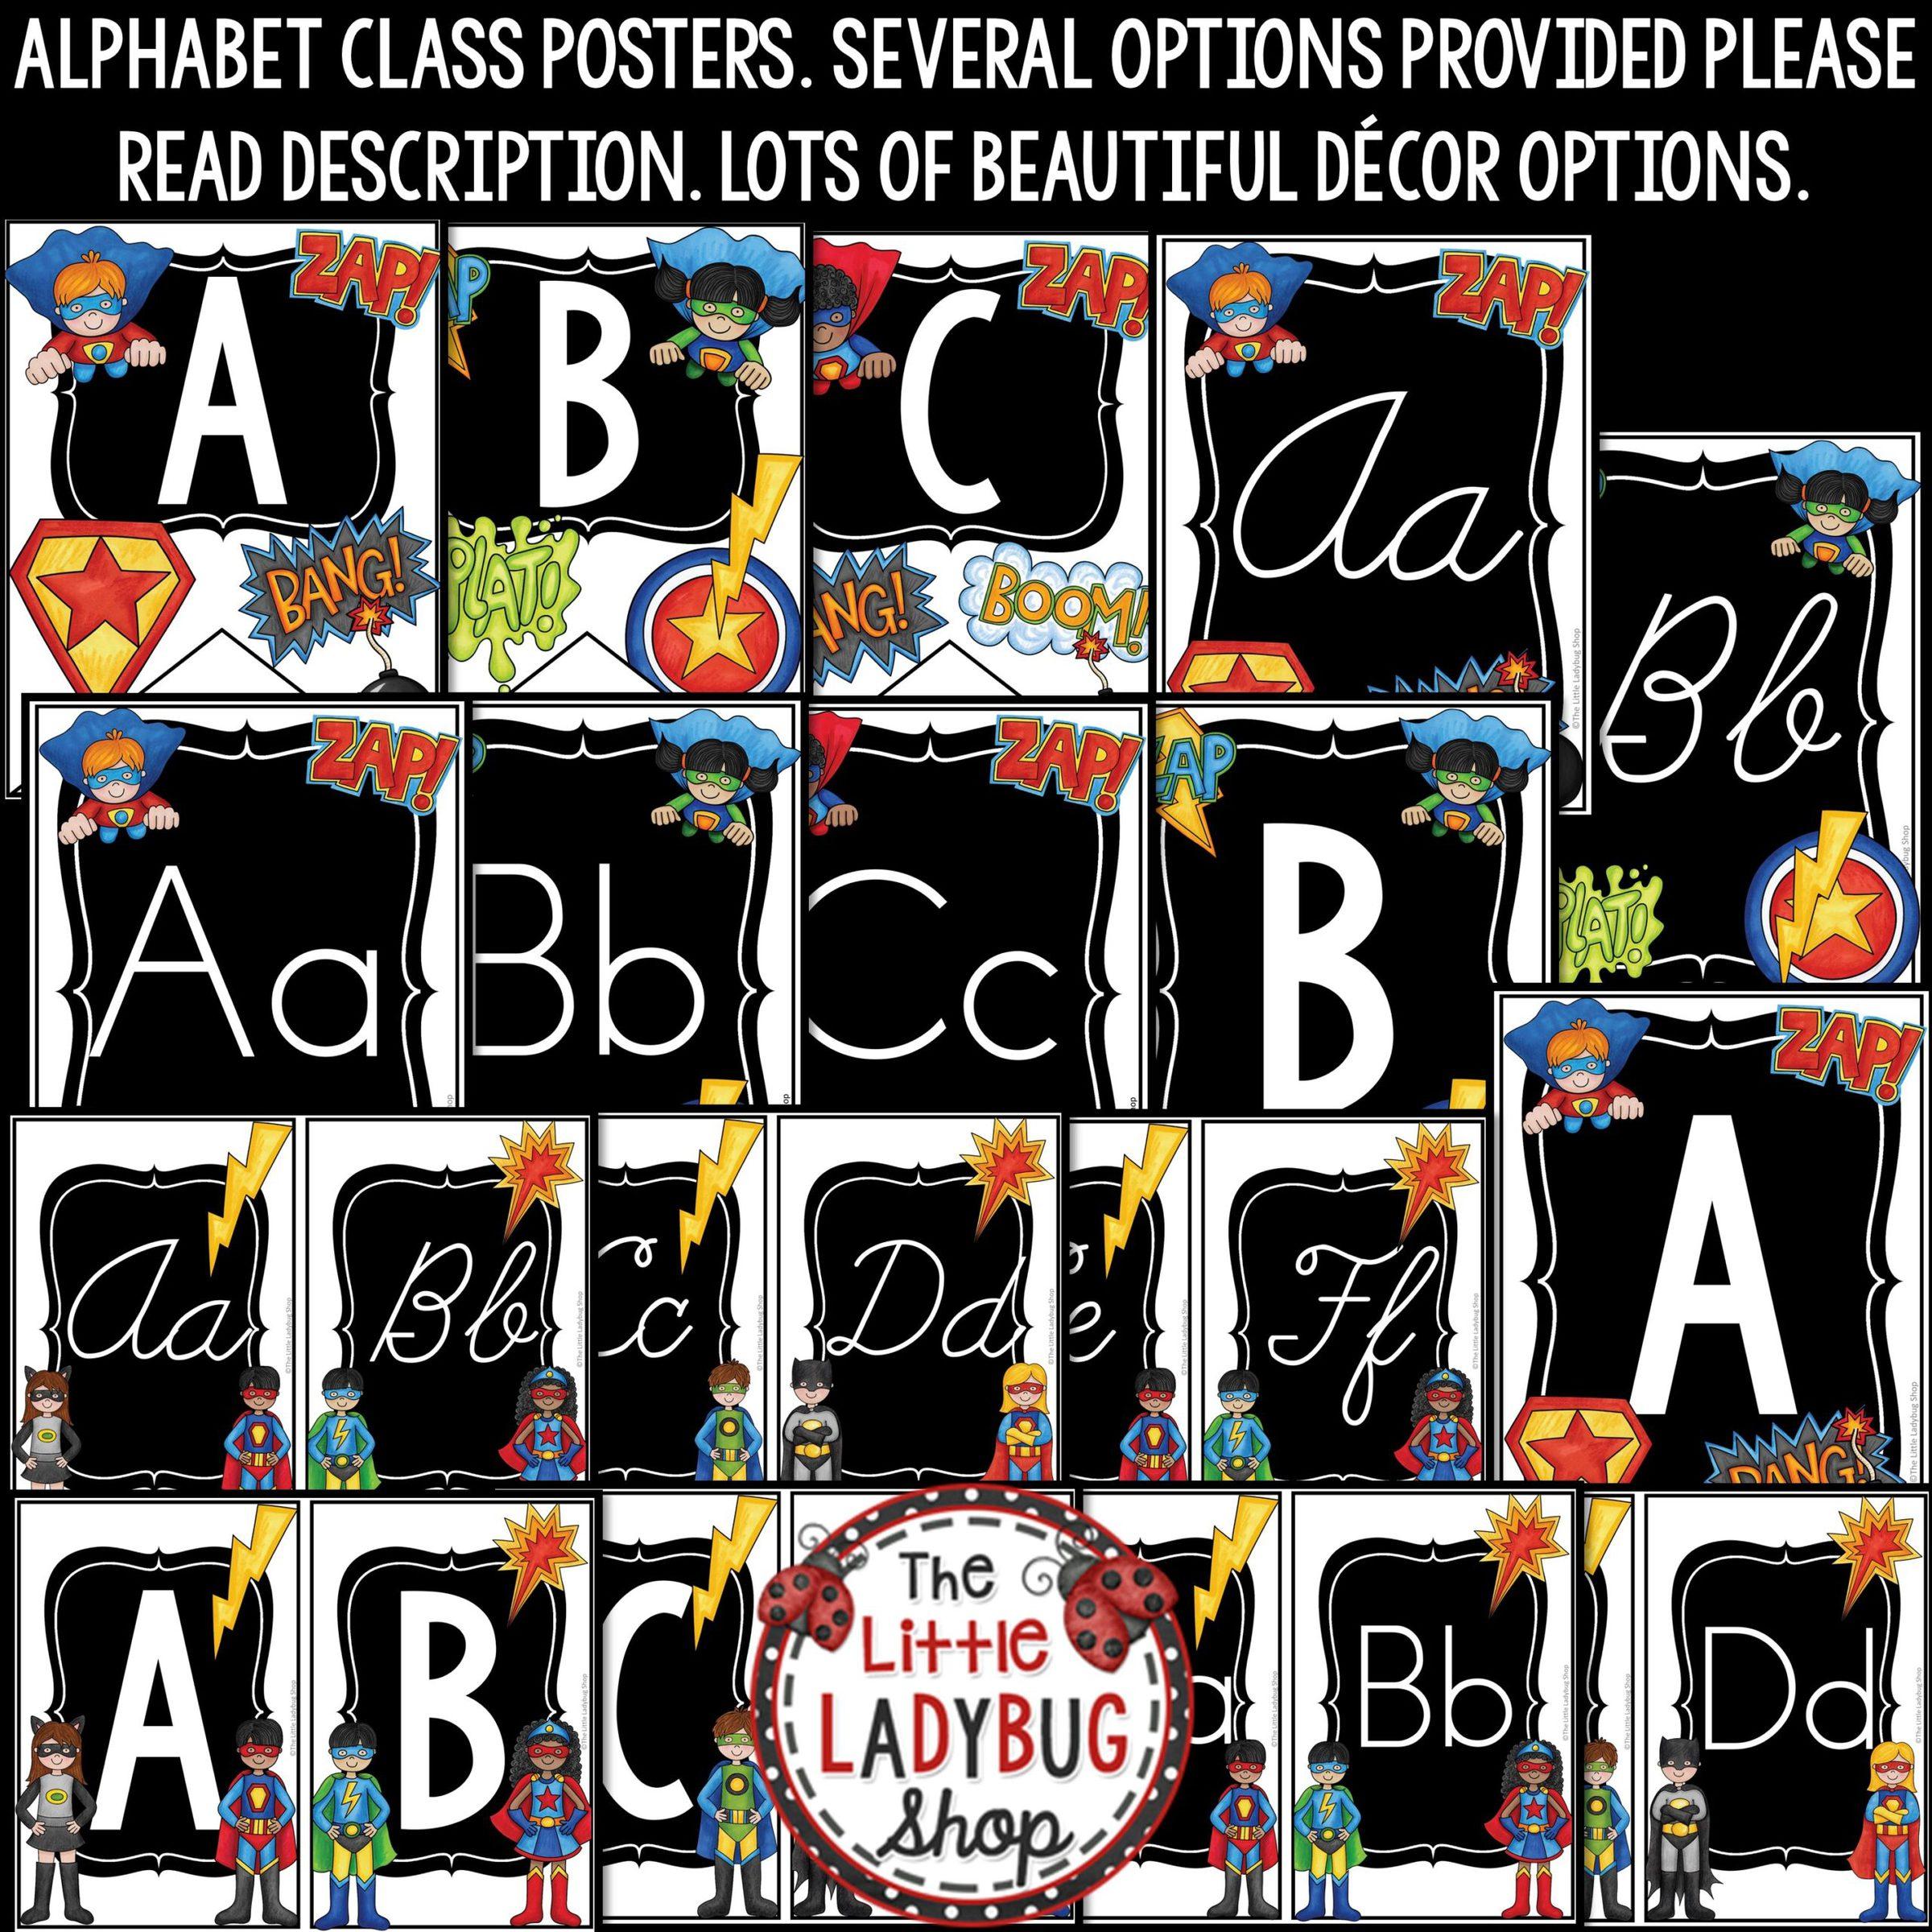 Superhero Classroom Theme Decor Print Cursive Alphabet Posters Bulletin Board The Little Ladybug Shop